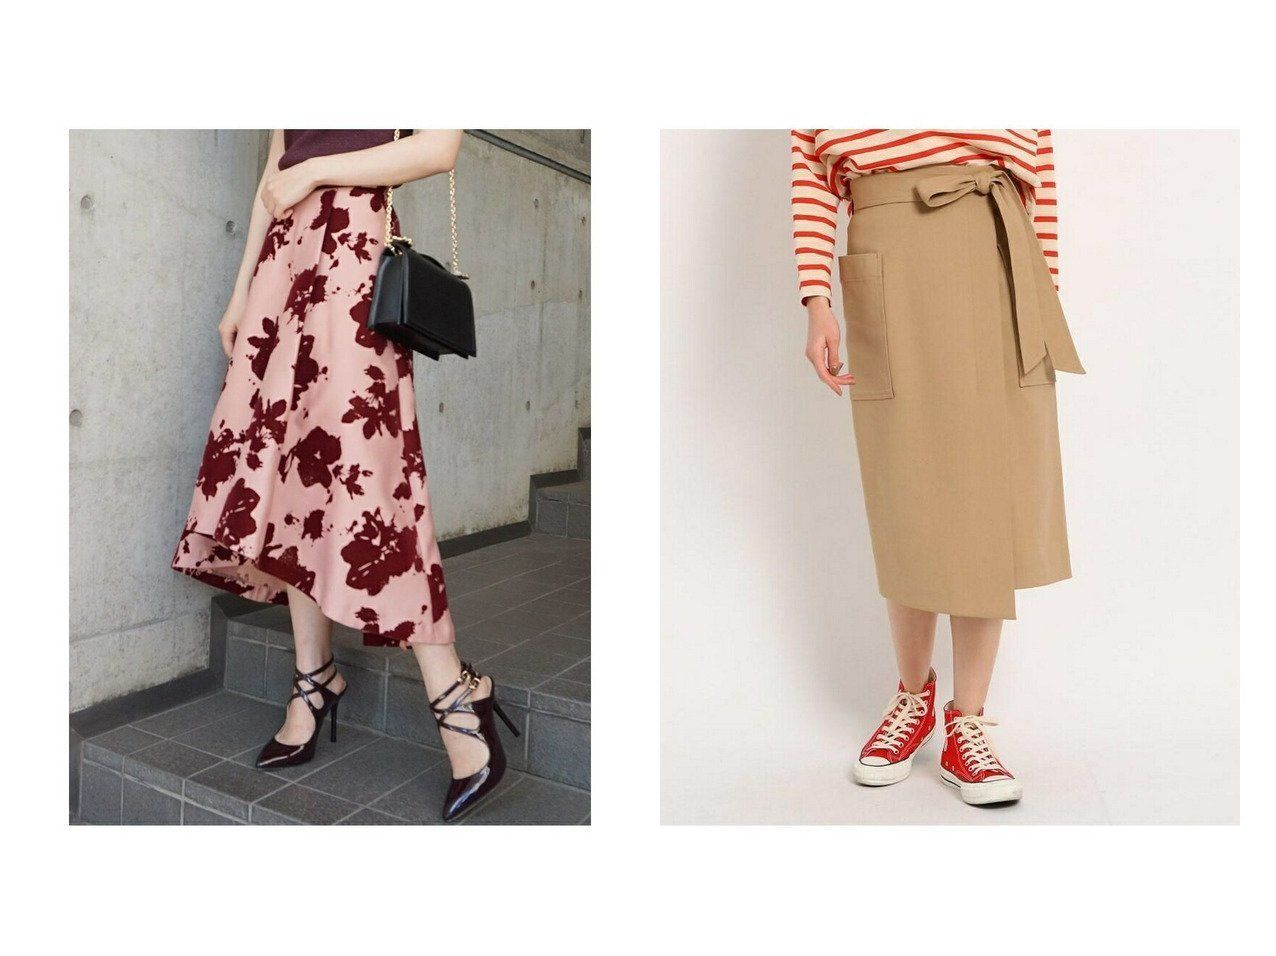 a24d8eddff342 スカートのおすすめ!人気、春夏ファッションの通販  MERCURYDUO マーキュリーデュオ